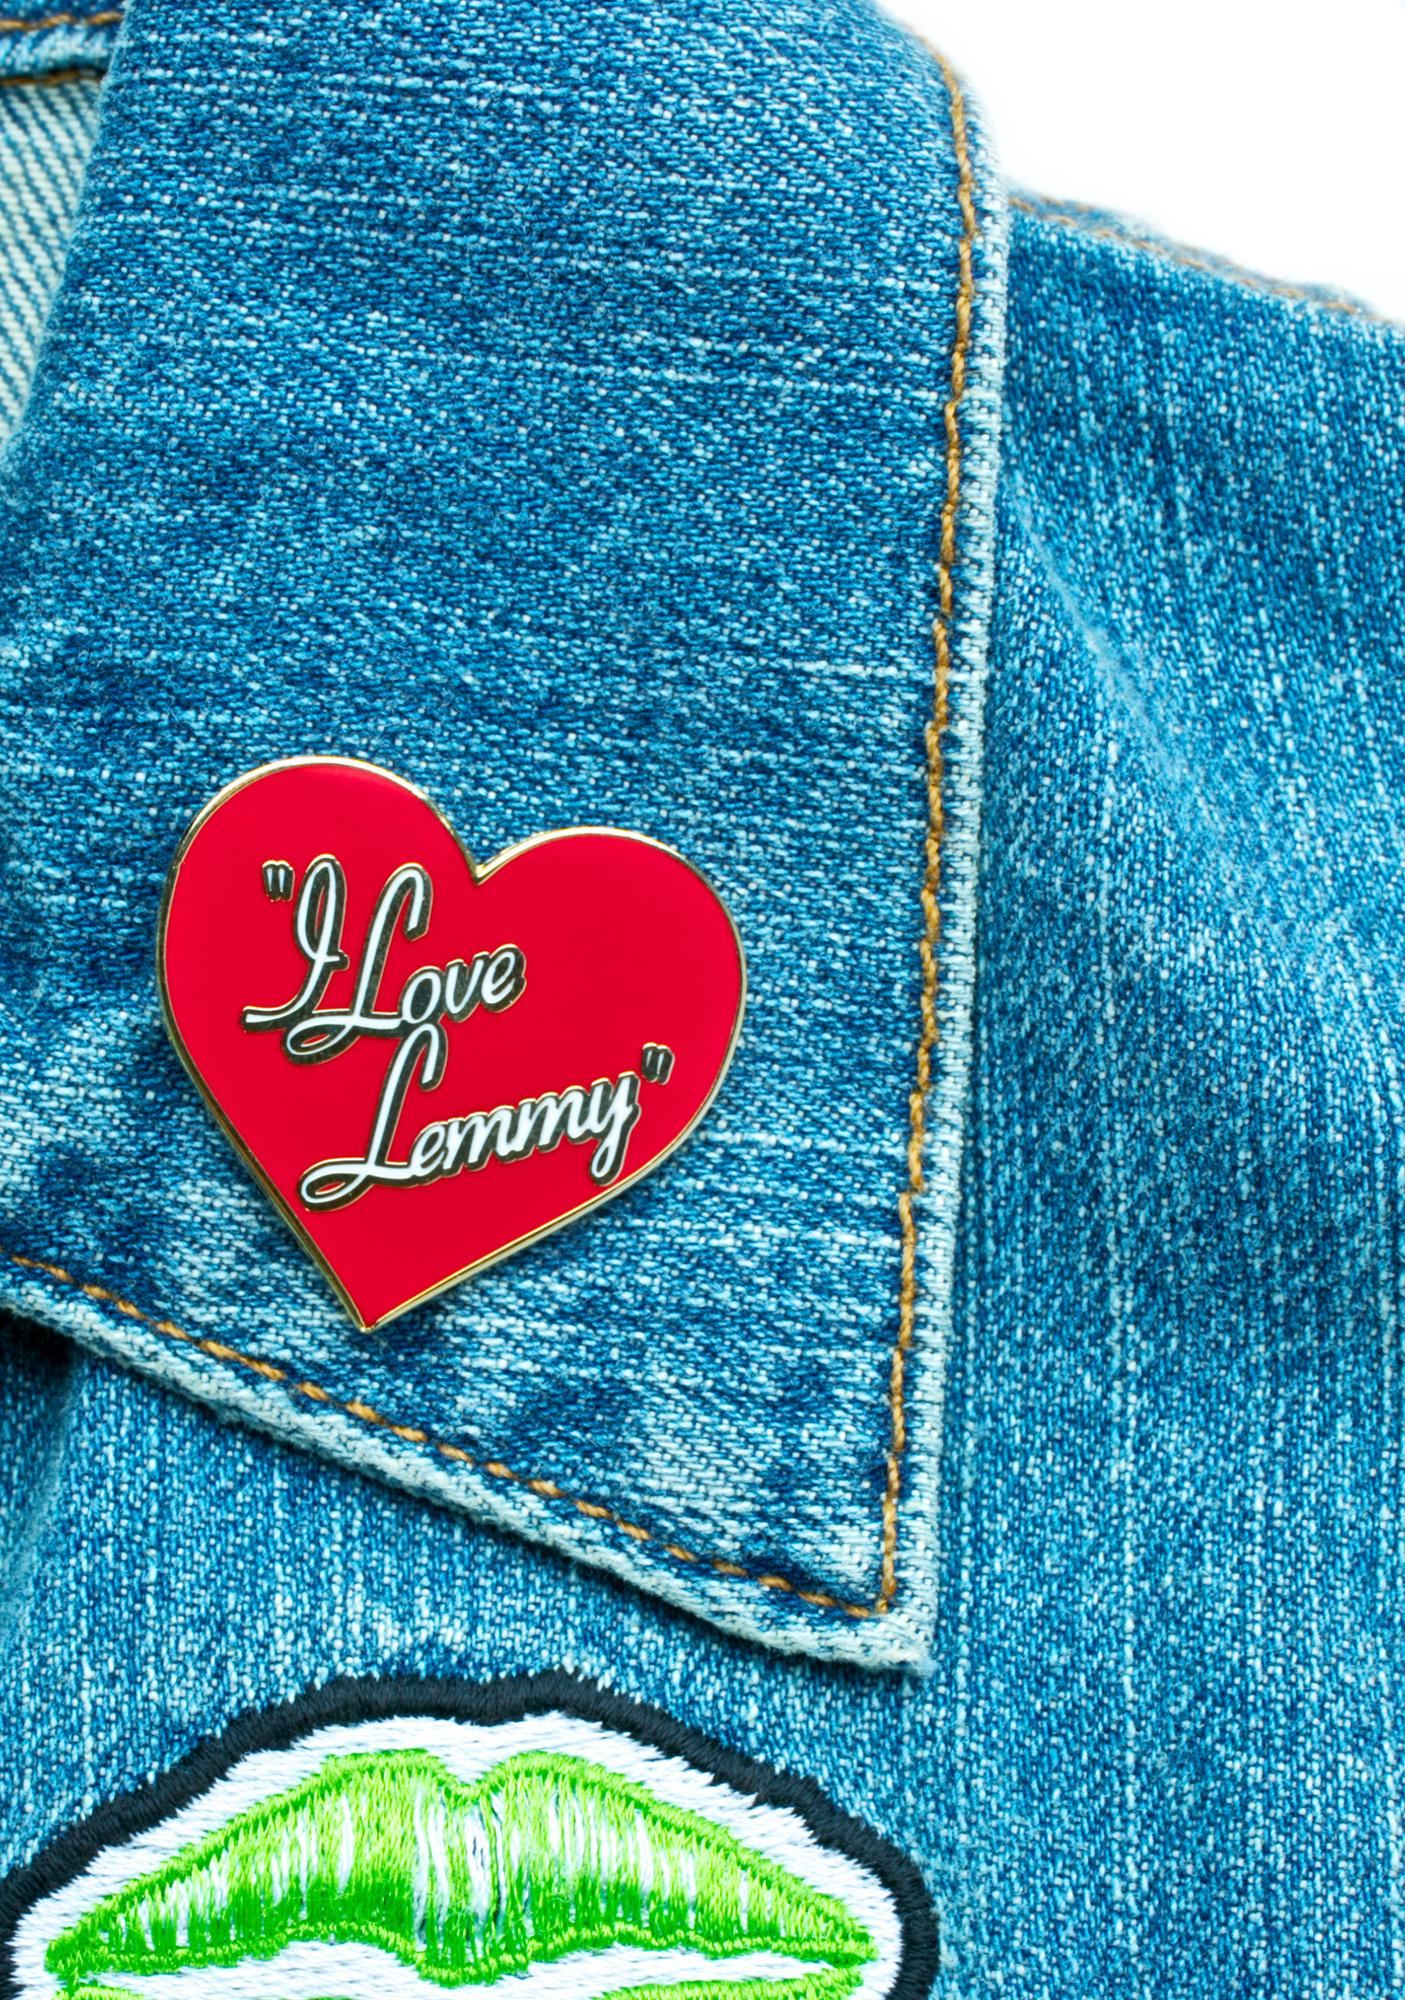 Yvng Pearl I Love Lemmy Pin